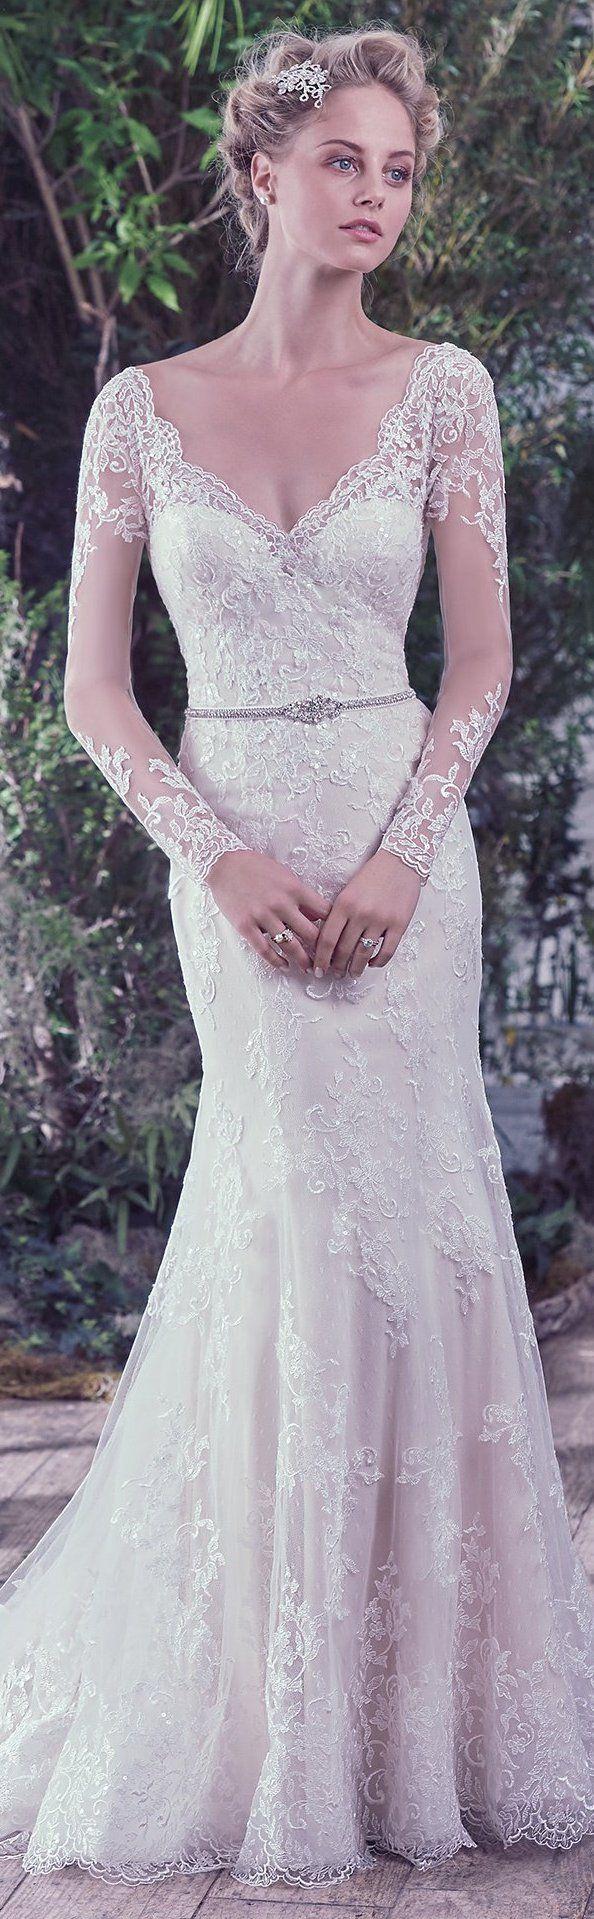 Wedding Dress by Maggie Sottero 2016 Fall/Winter Collection - Roberta | #maggiesottero #maggiebride